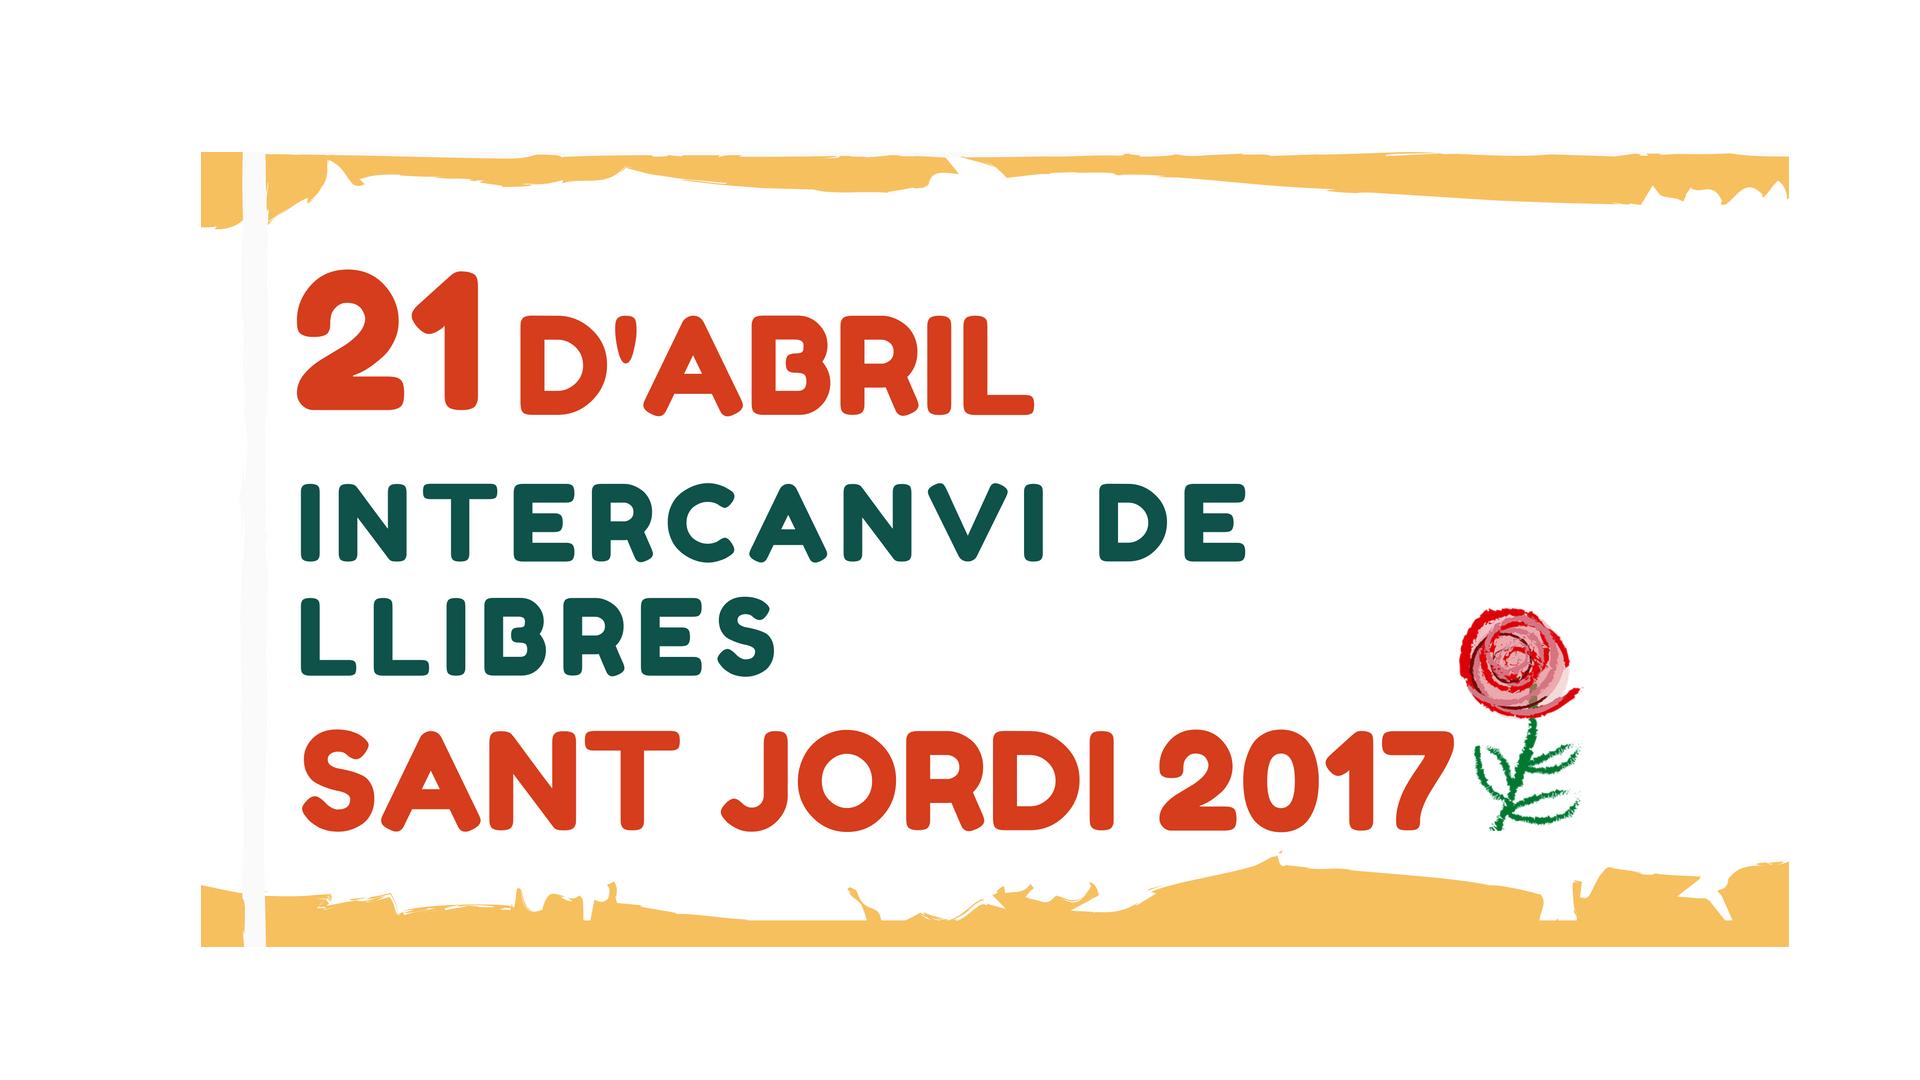 Sant Jordi 2017